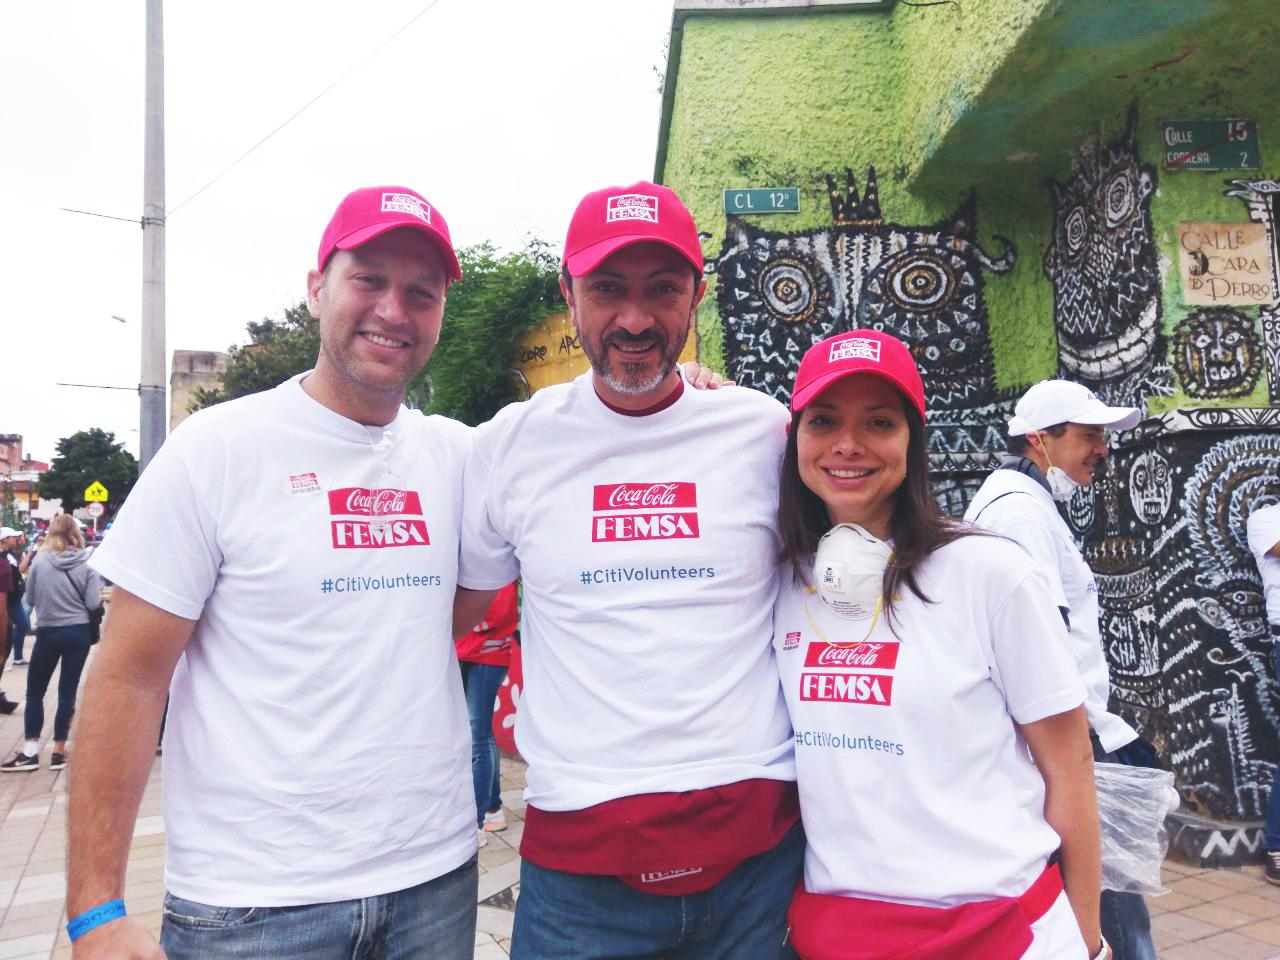 coca-cola-femsa-voluntarios-kof-citi